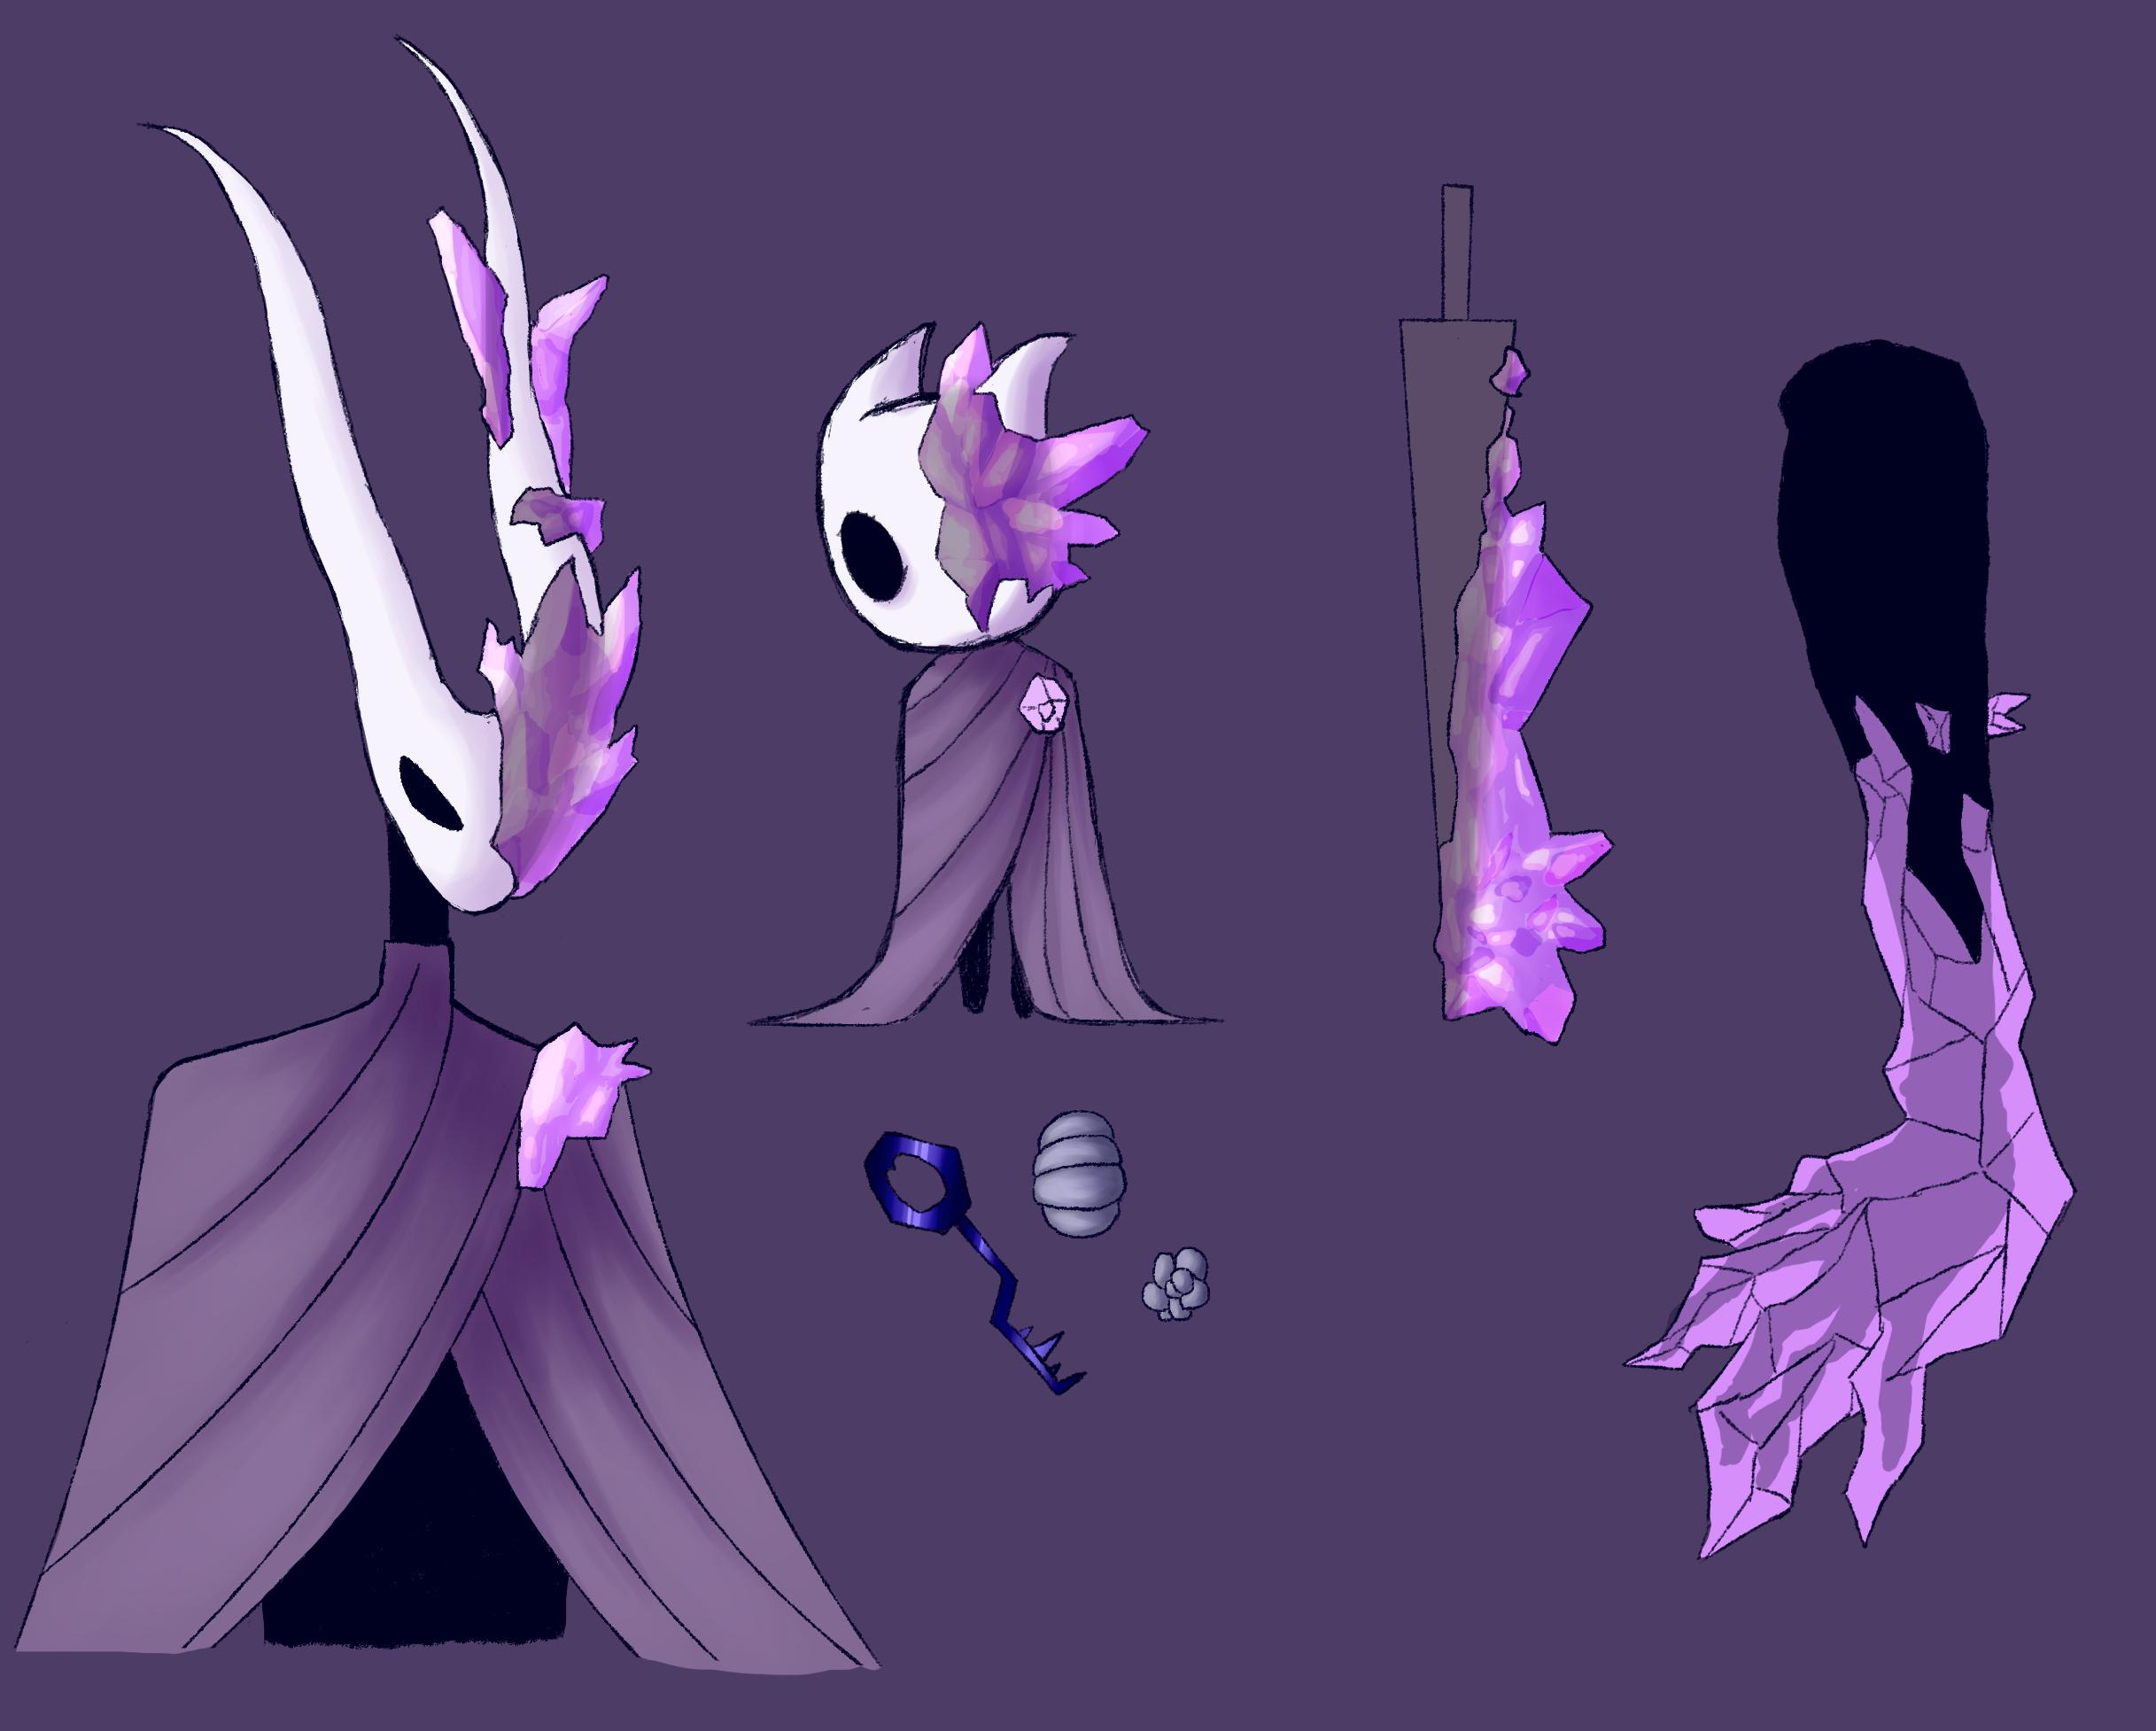 Hollow Knight Vessel Oc By Gadridel On Deviantart In 2020 Knight Character Design Hollow Art